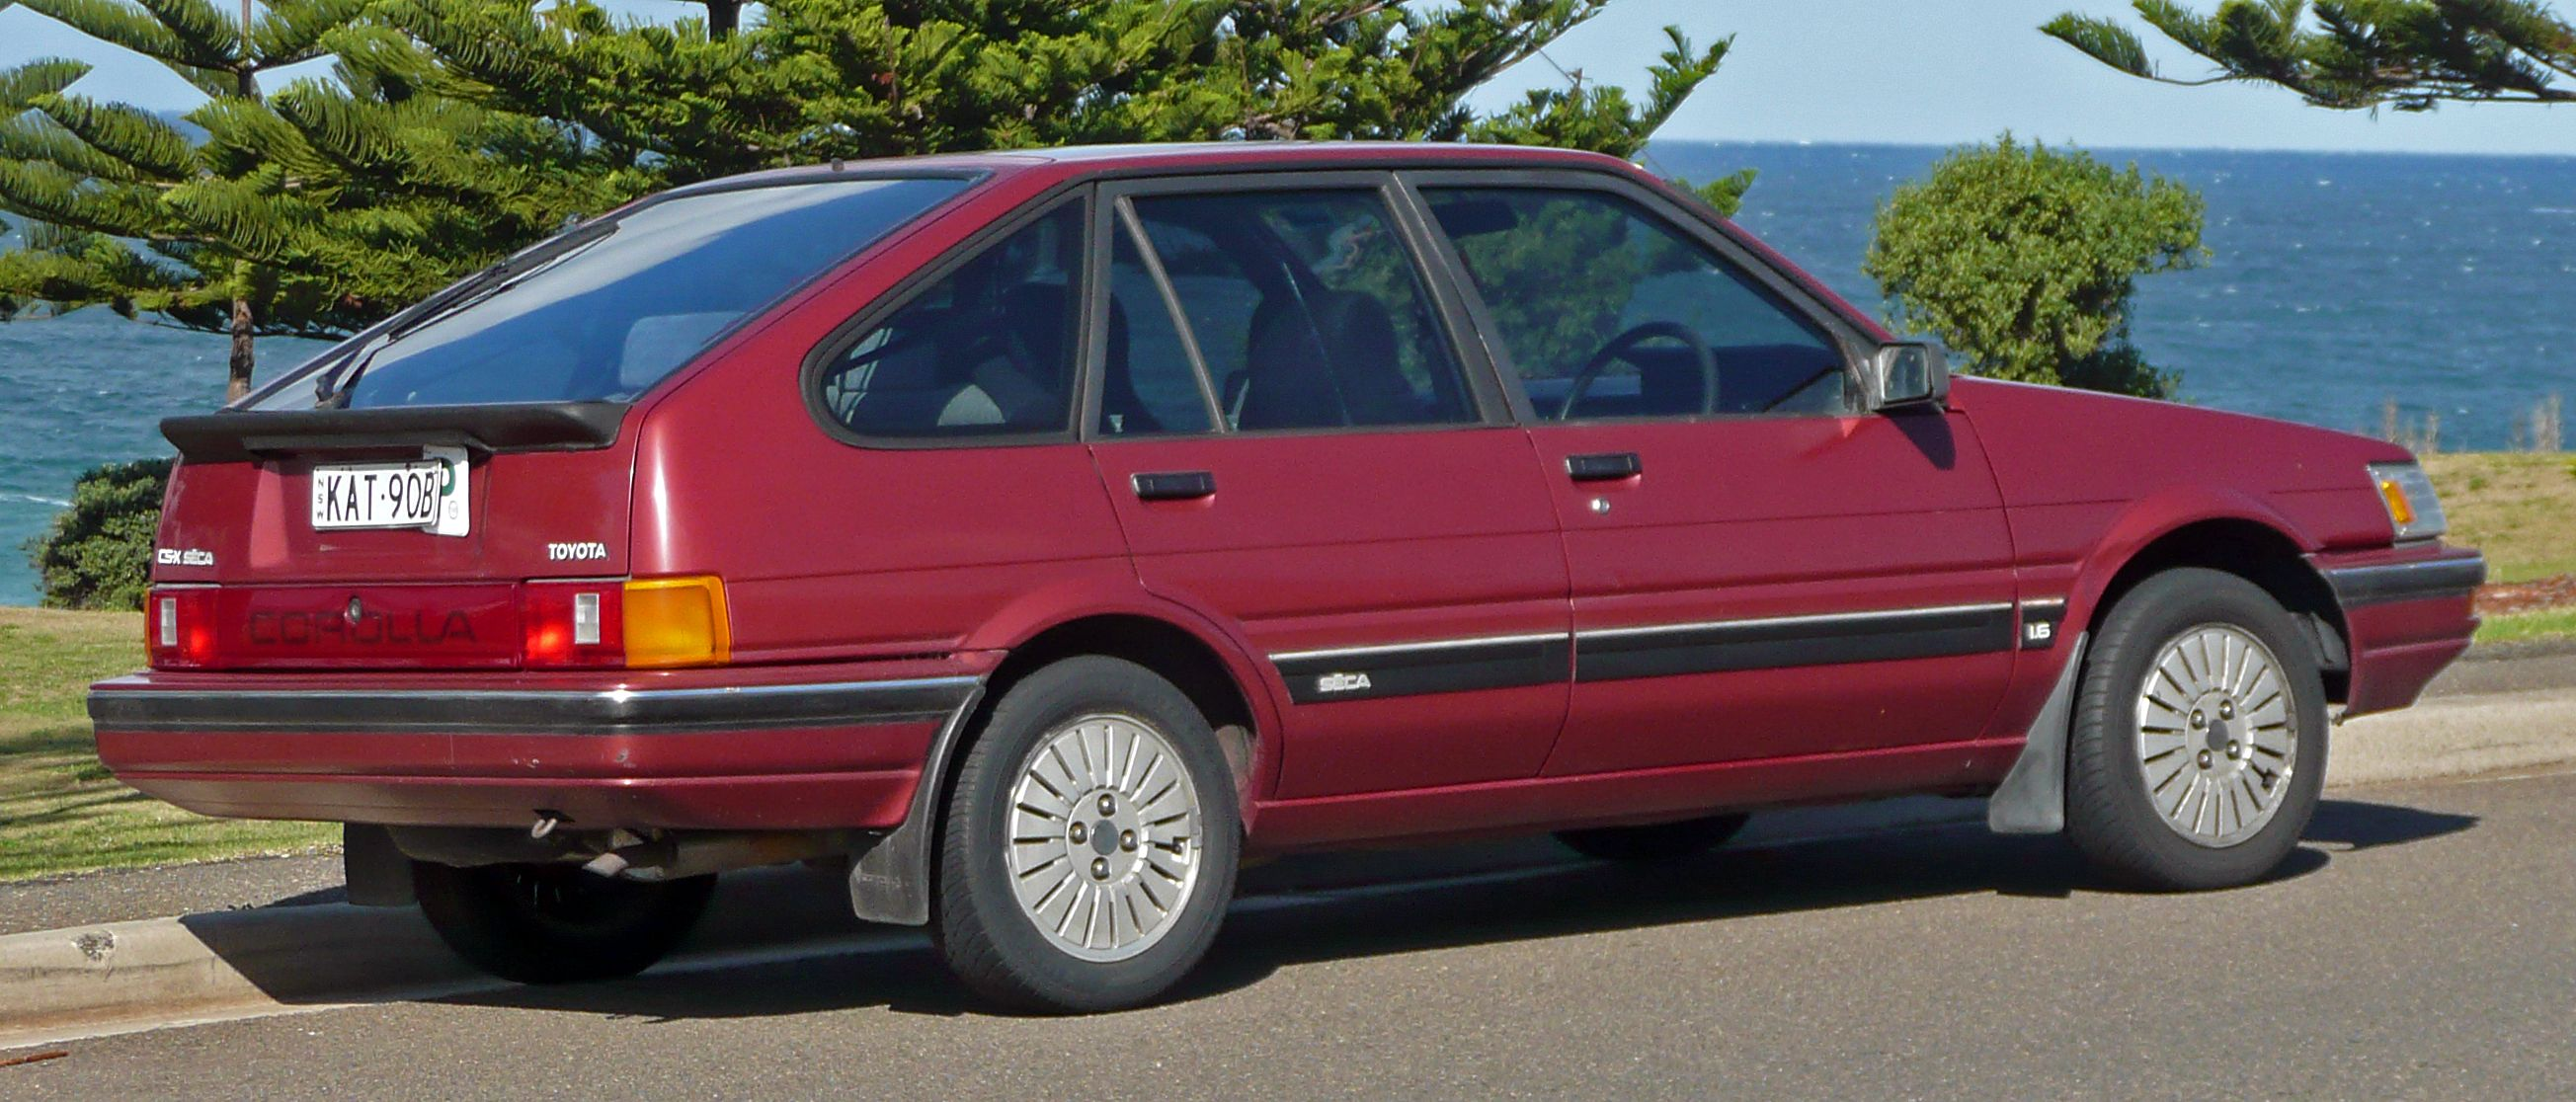 1986 1989 toyota corolla ae82 csx seca liftback toyota rh pinterest com 2014 Toyota Corolla 1995 Toyota Corolla